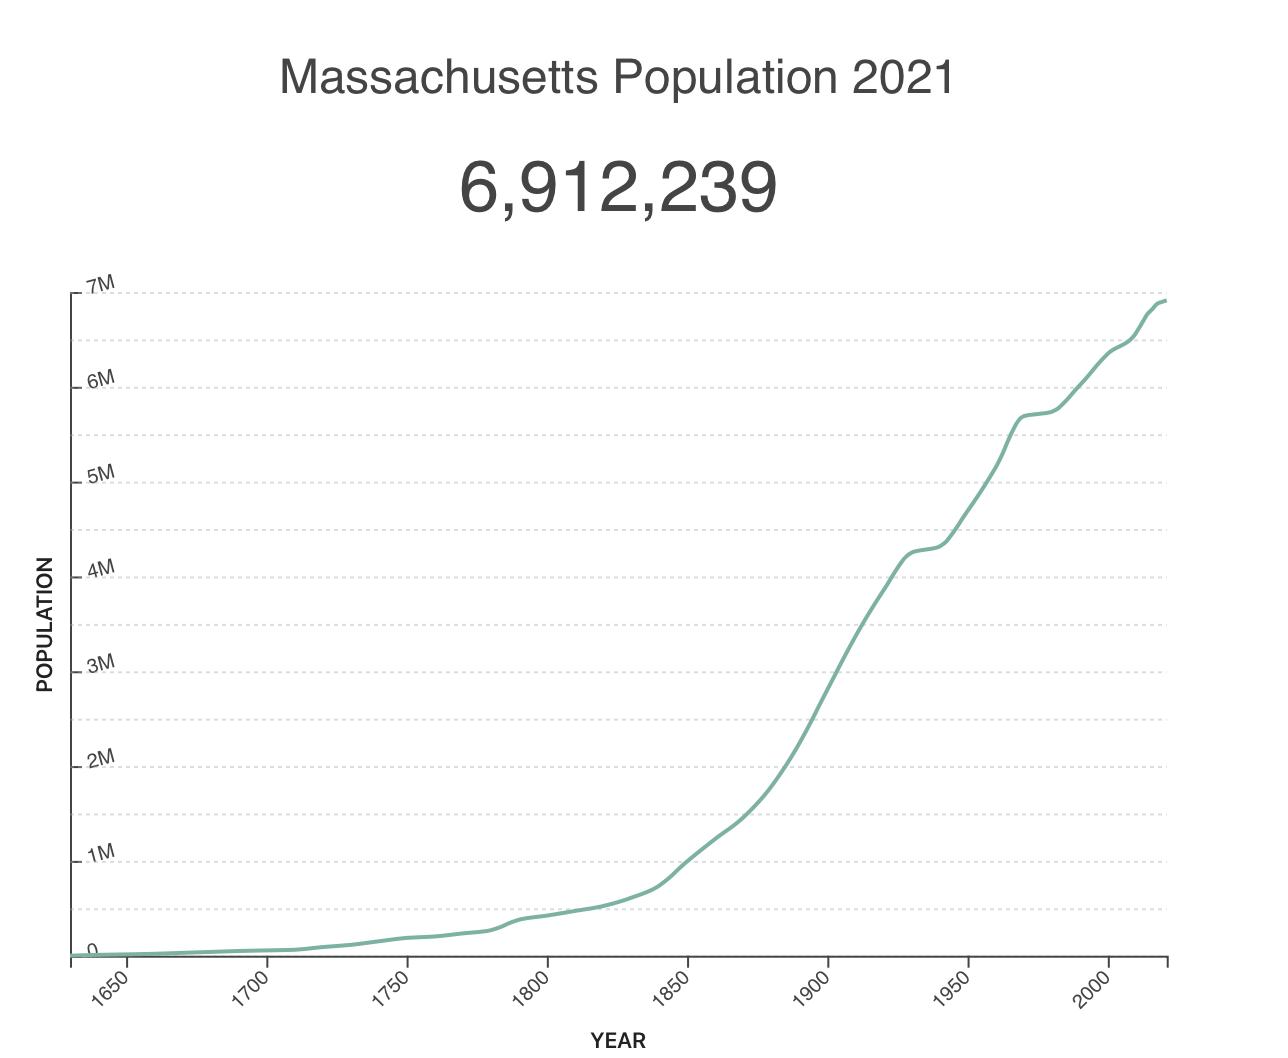 Massachusetts population